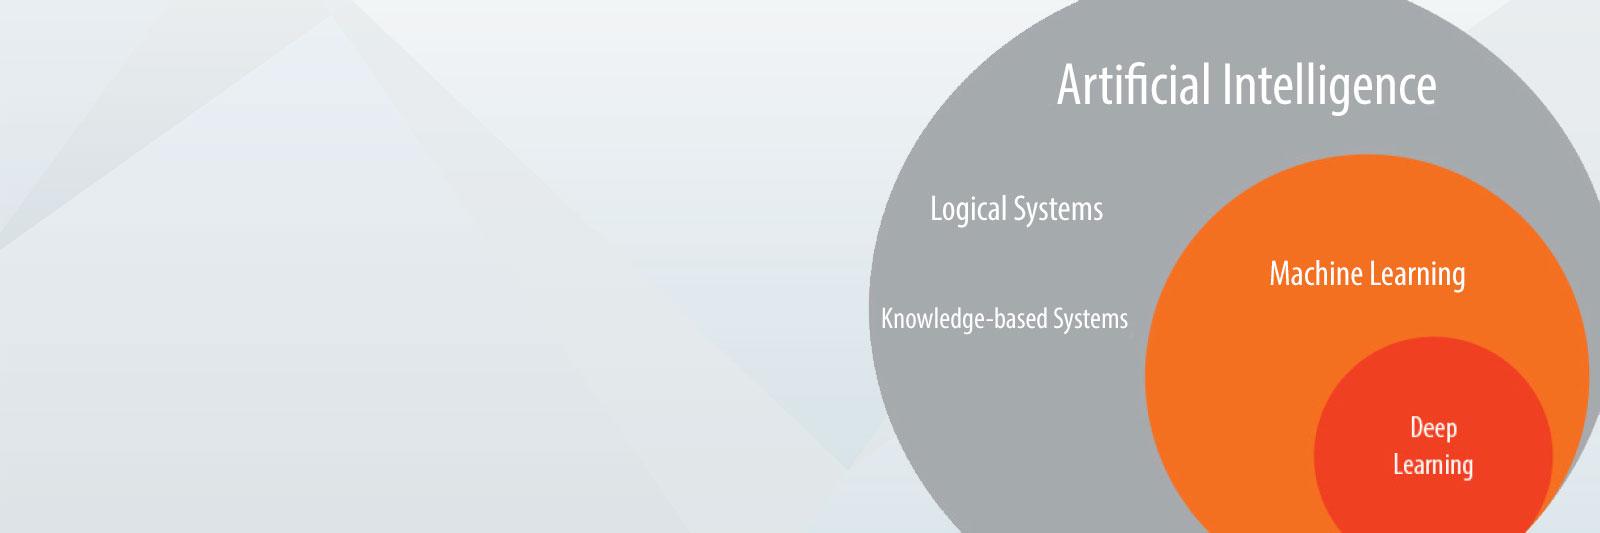 deep-learning-title-l.jpg